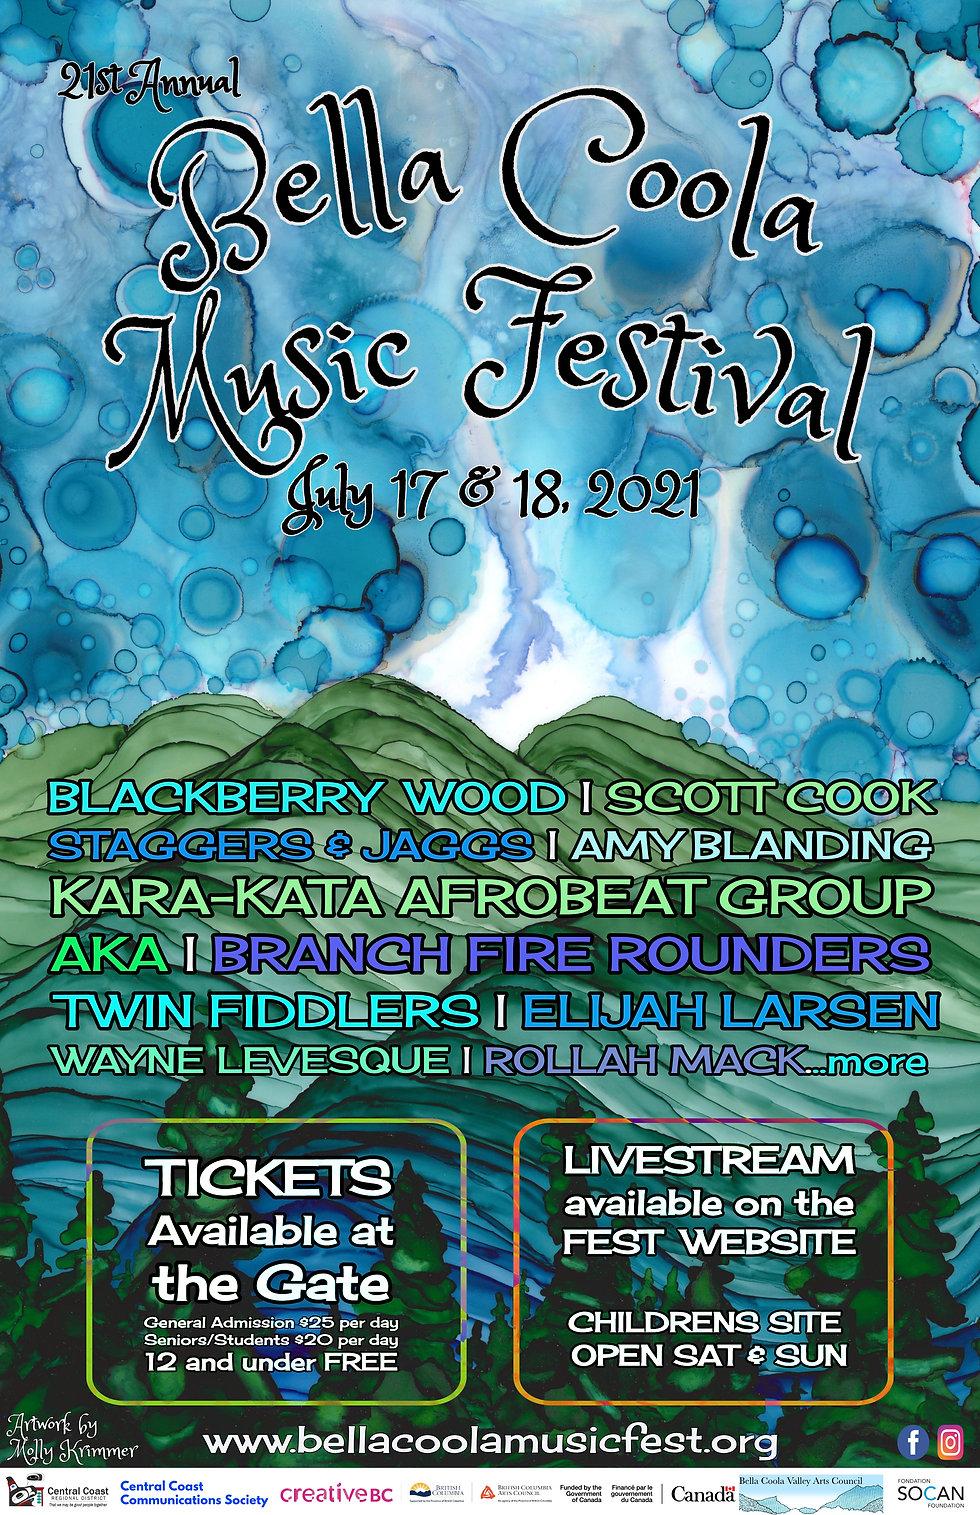 bella coola music festival 2021